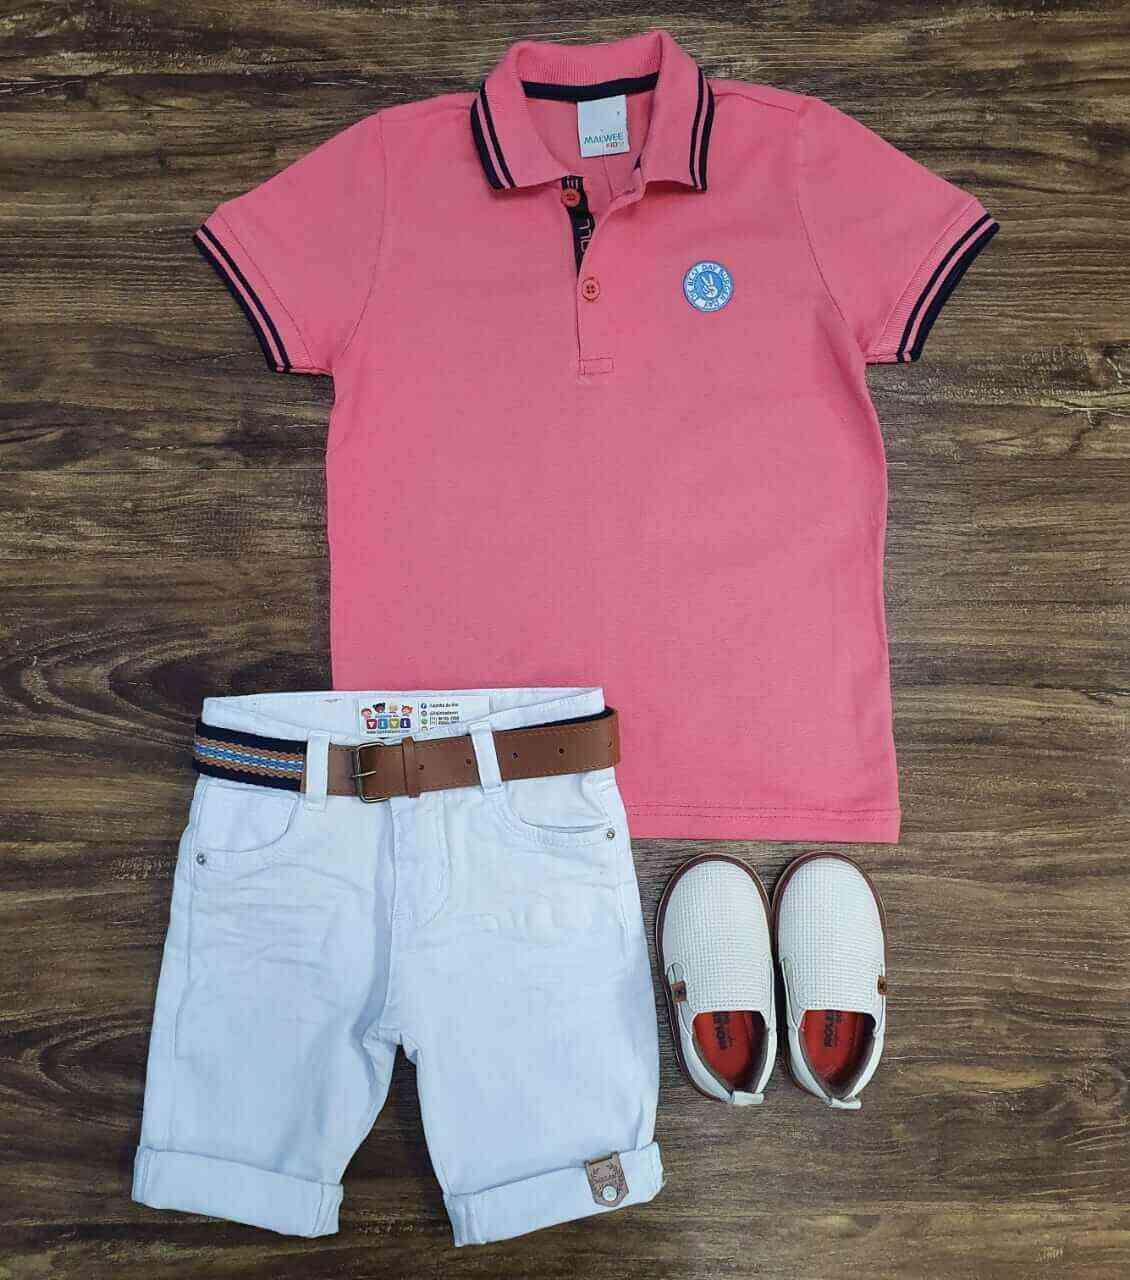 Bermuda Branca com Camisa Polo Rosa Infantil